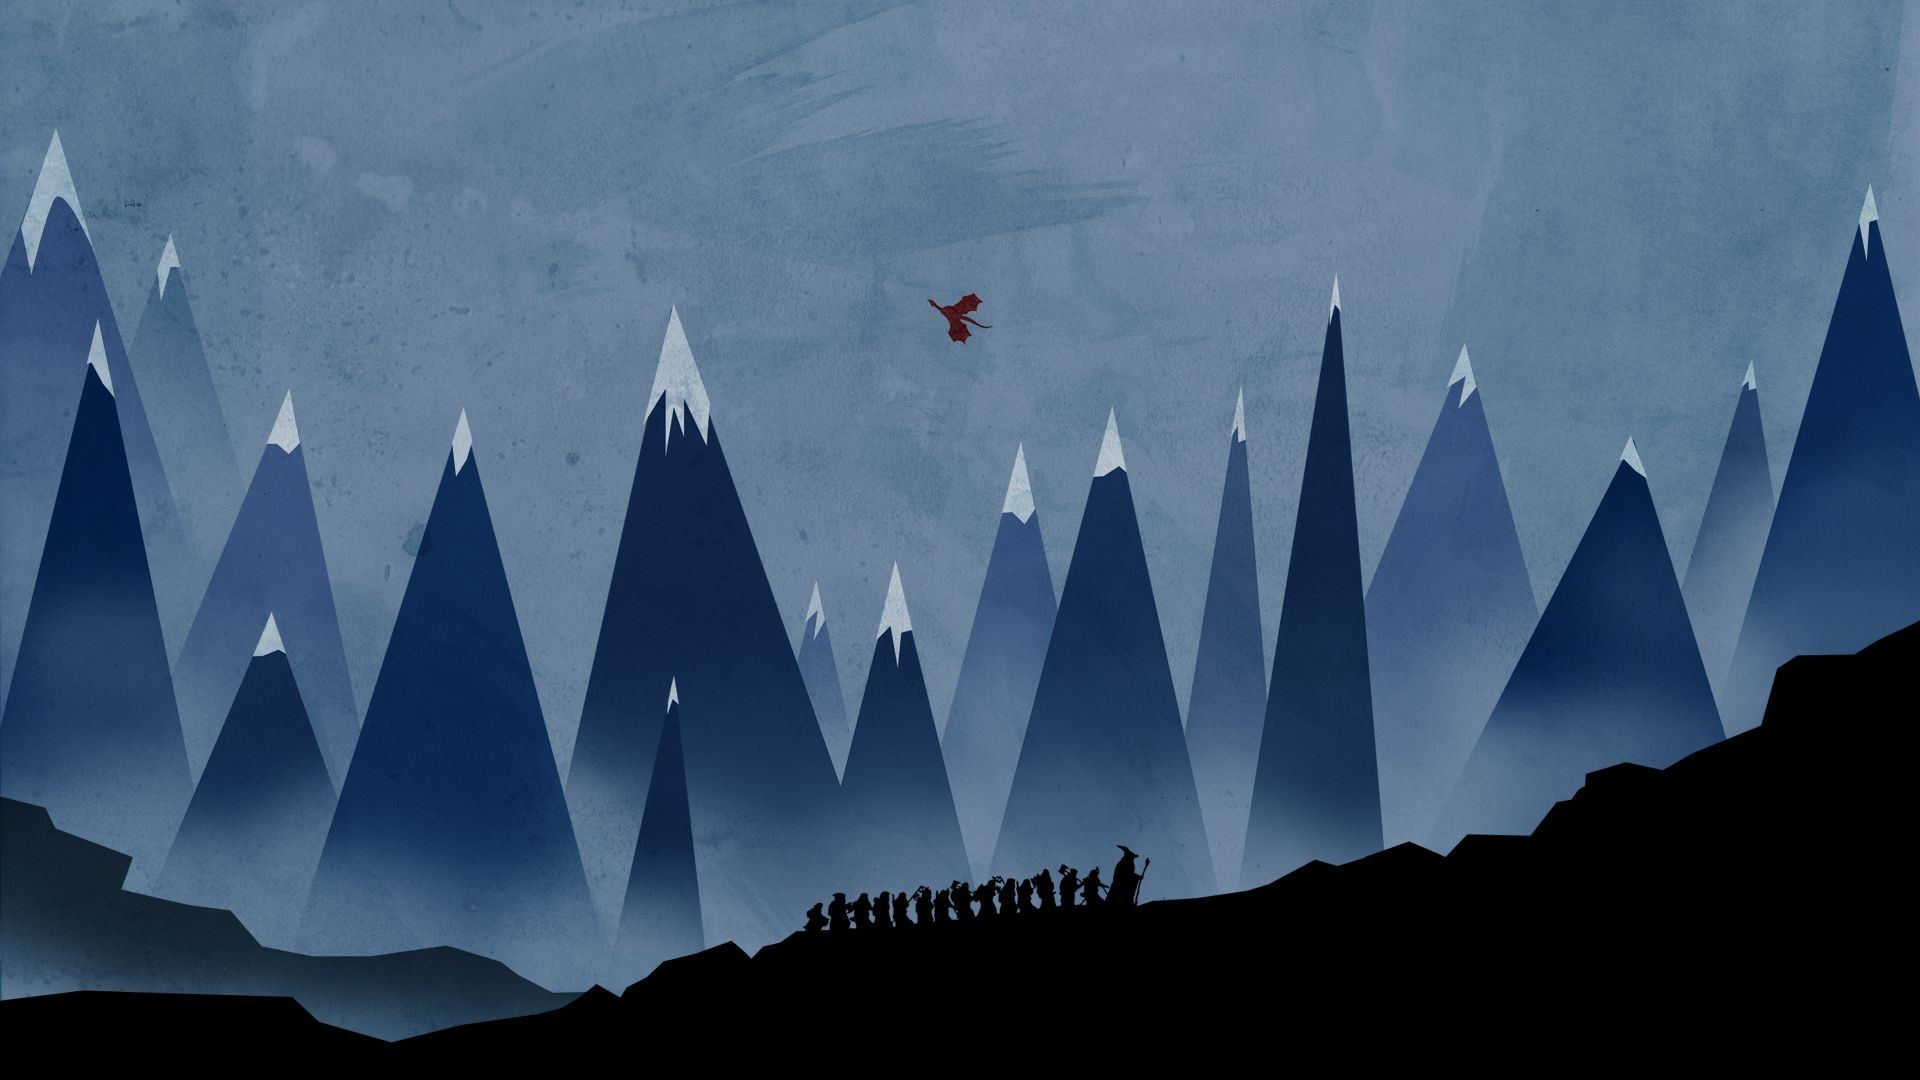 General 1920x1080 The Hobbit minimalism abstract Gandalf mountains Smaug artwork dragon silhouette fantasy art